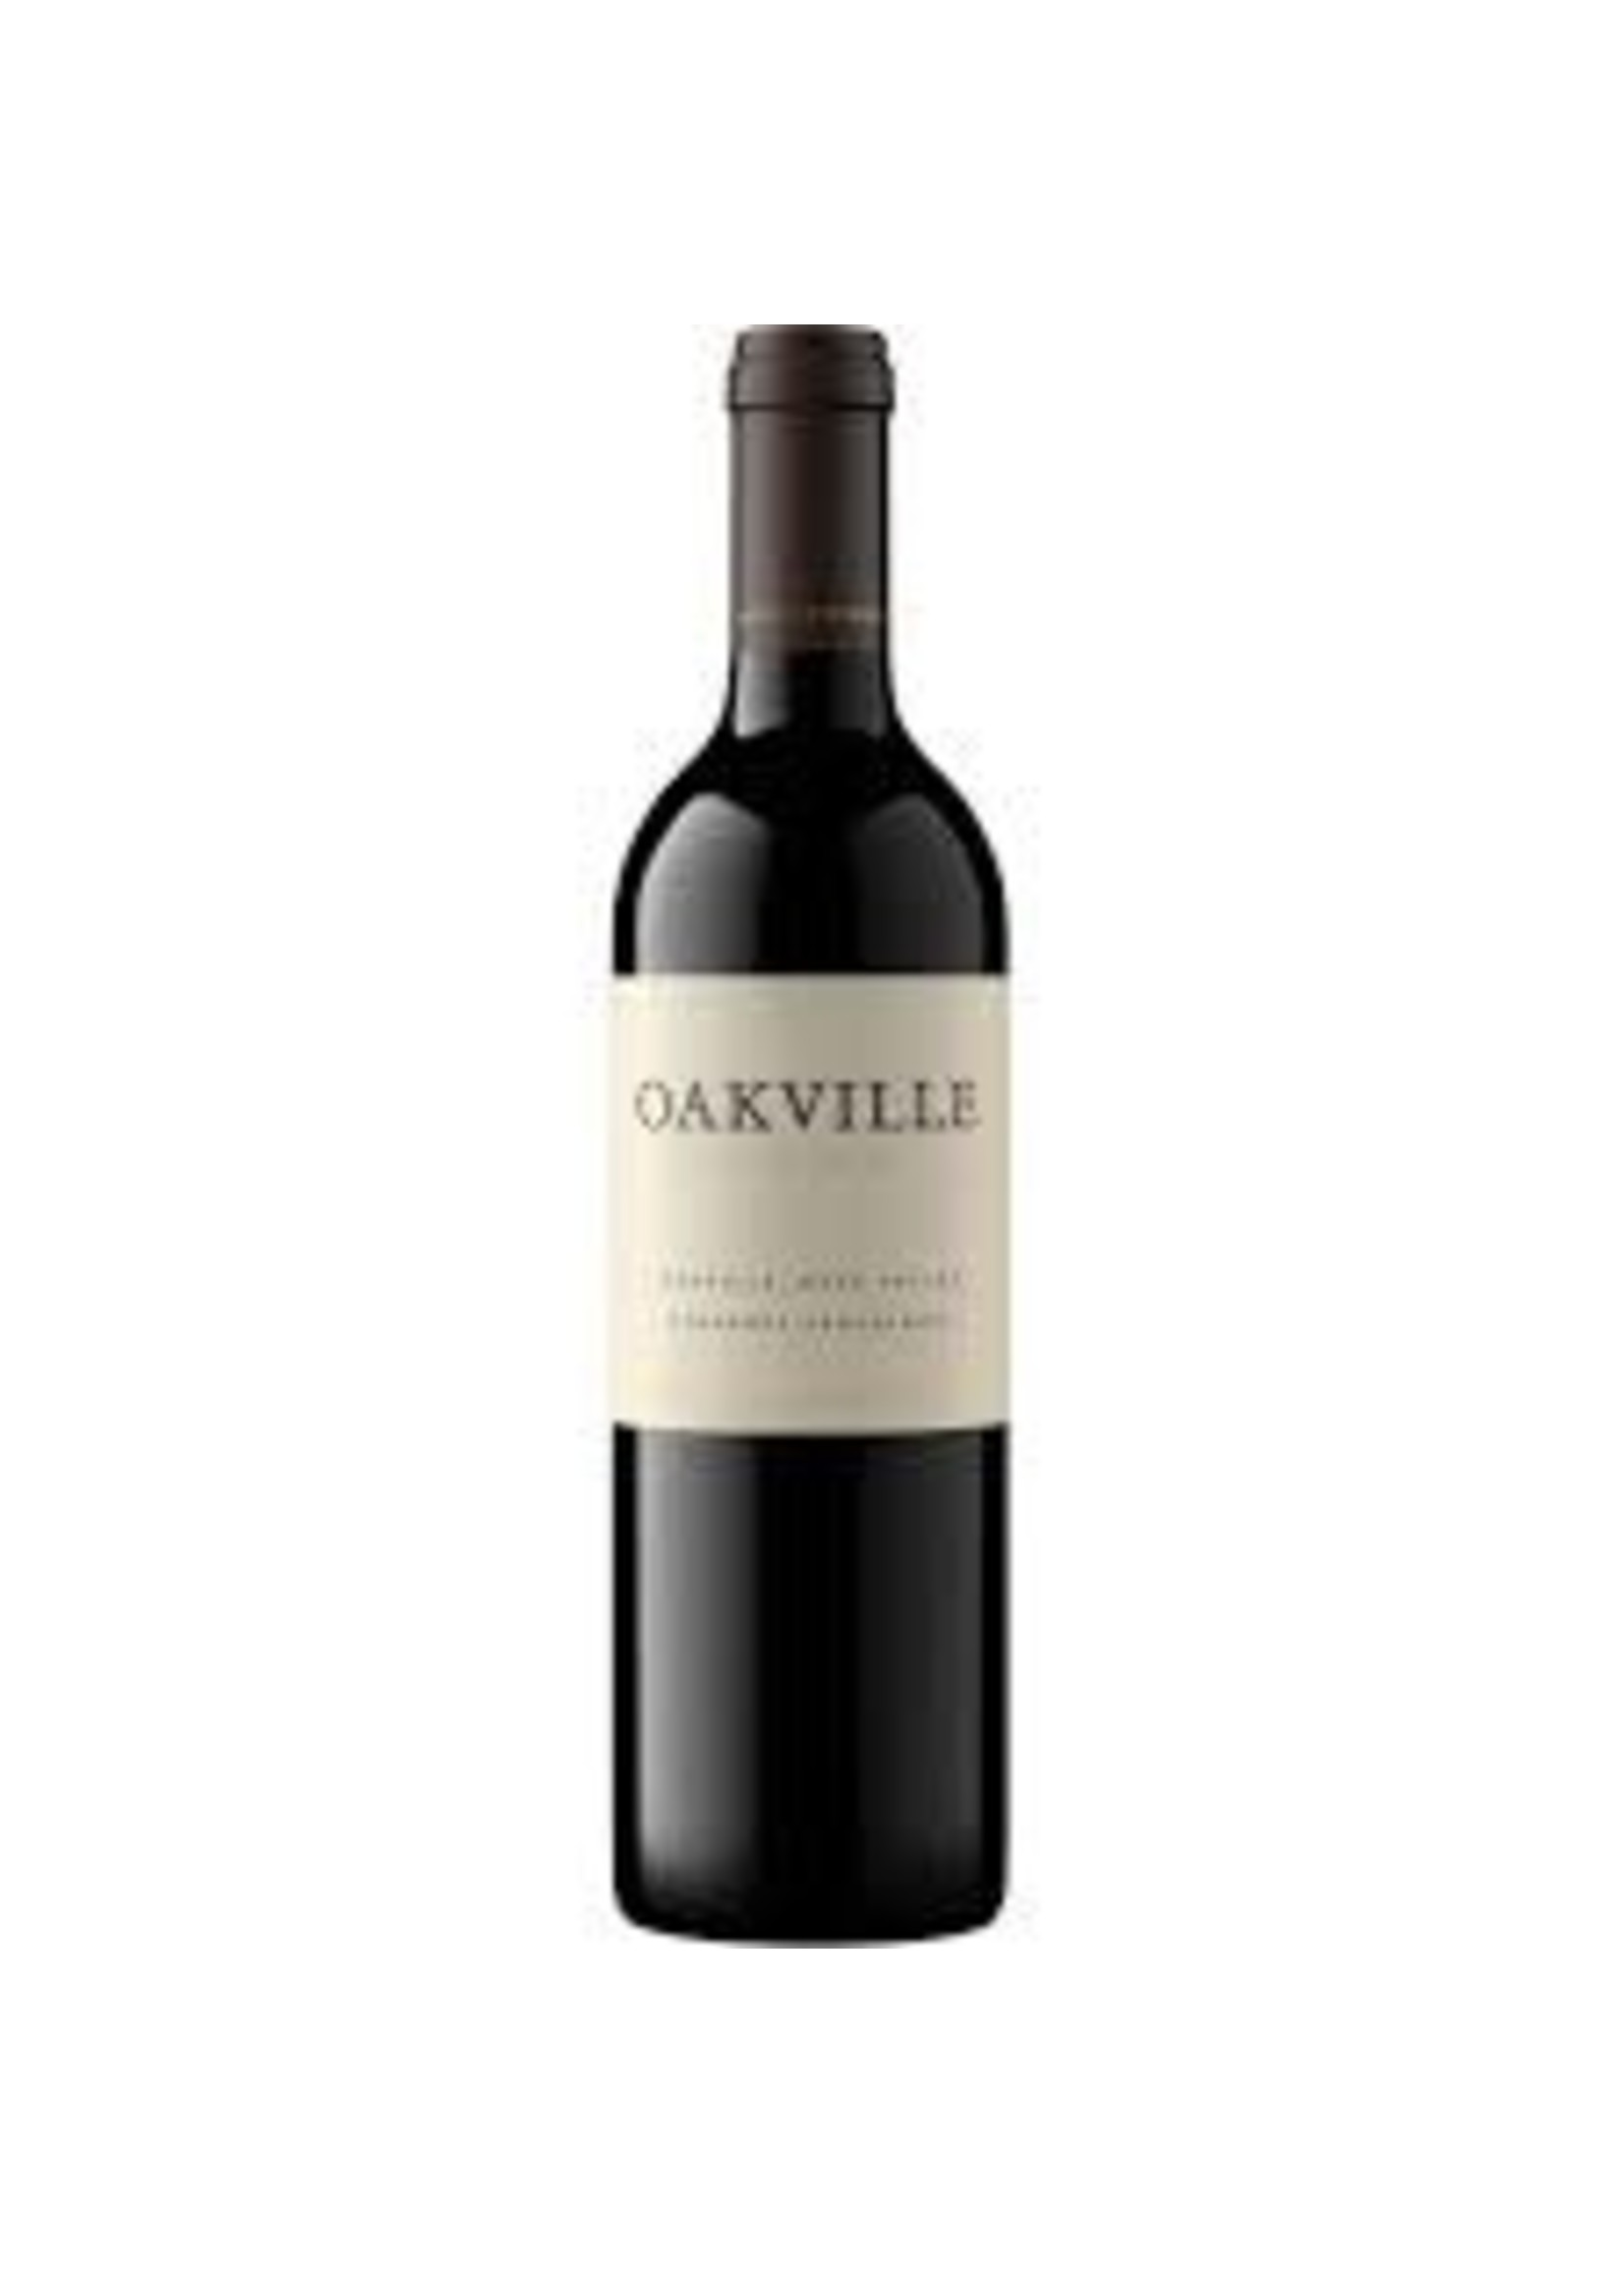 Oakville Winery 2017 Cabernet Sauvignon 750ml